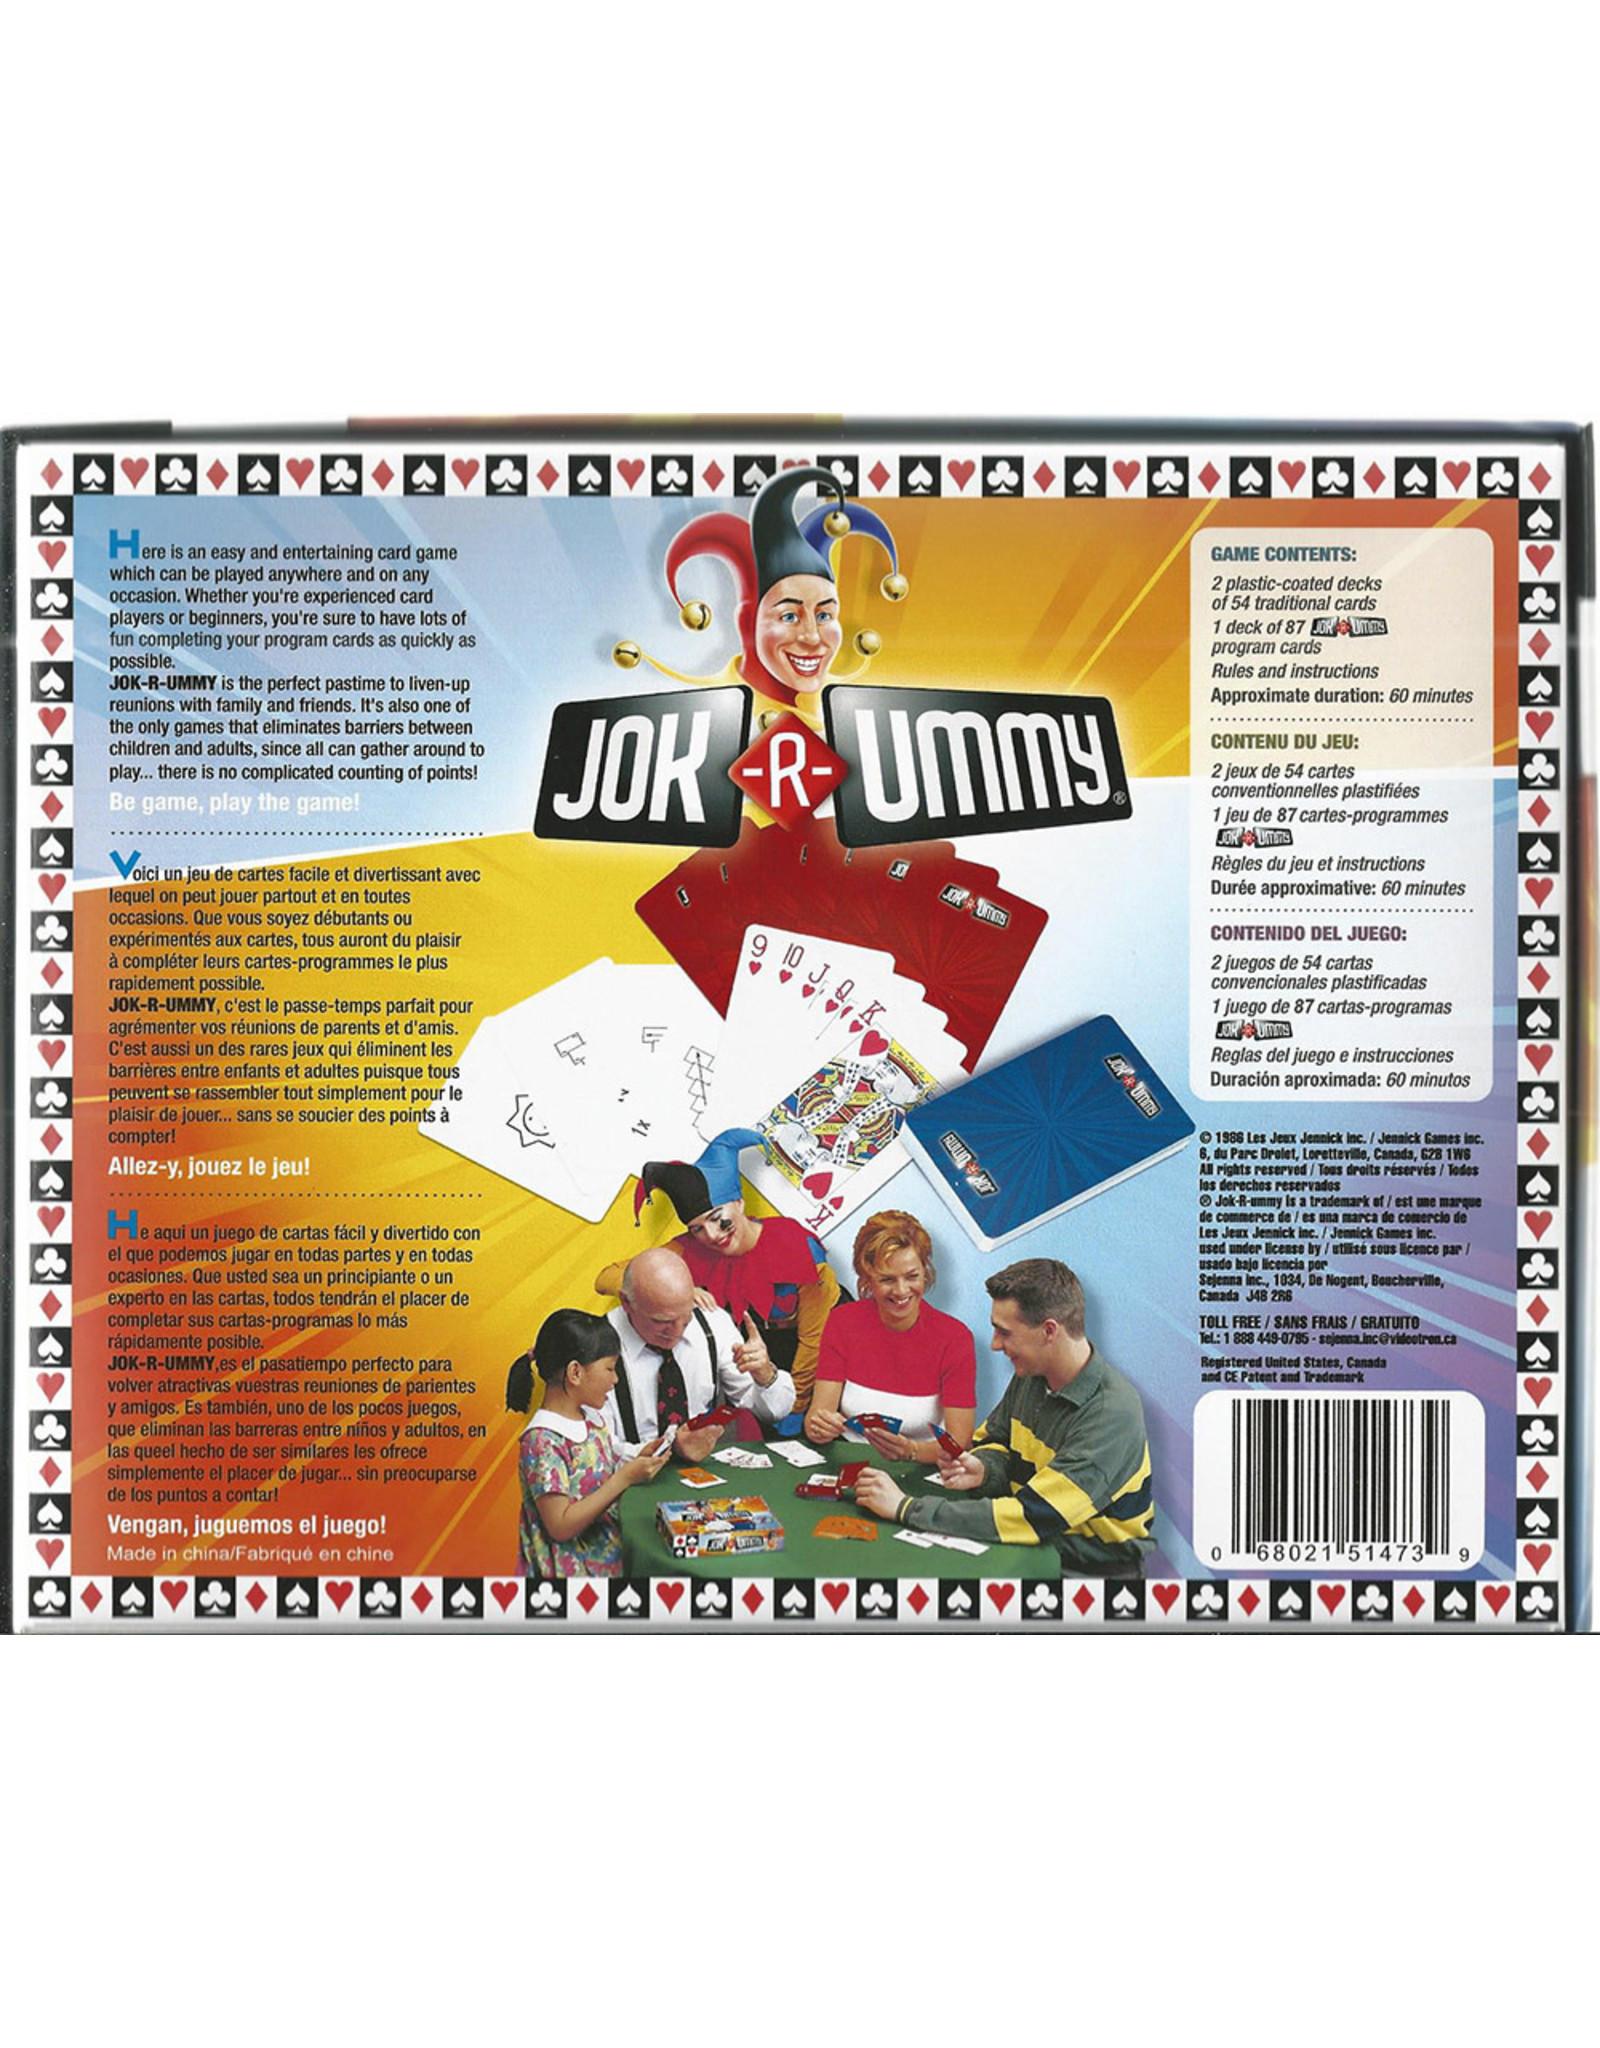 Jok-R-Ummy Game